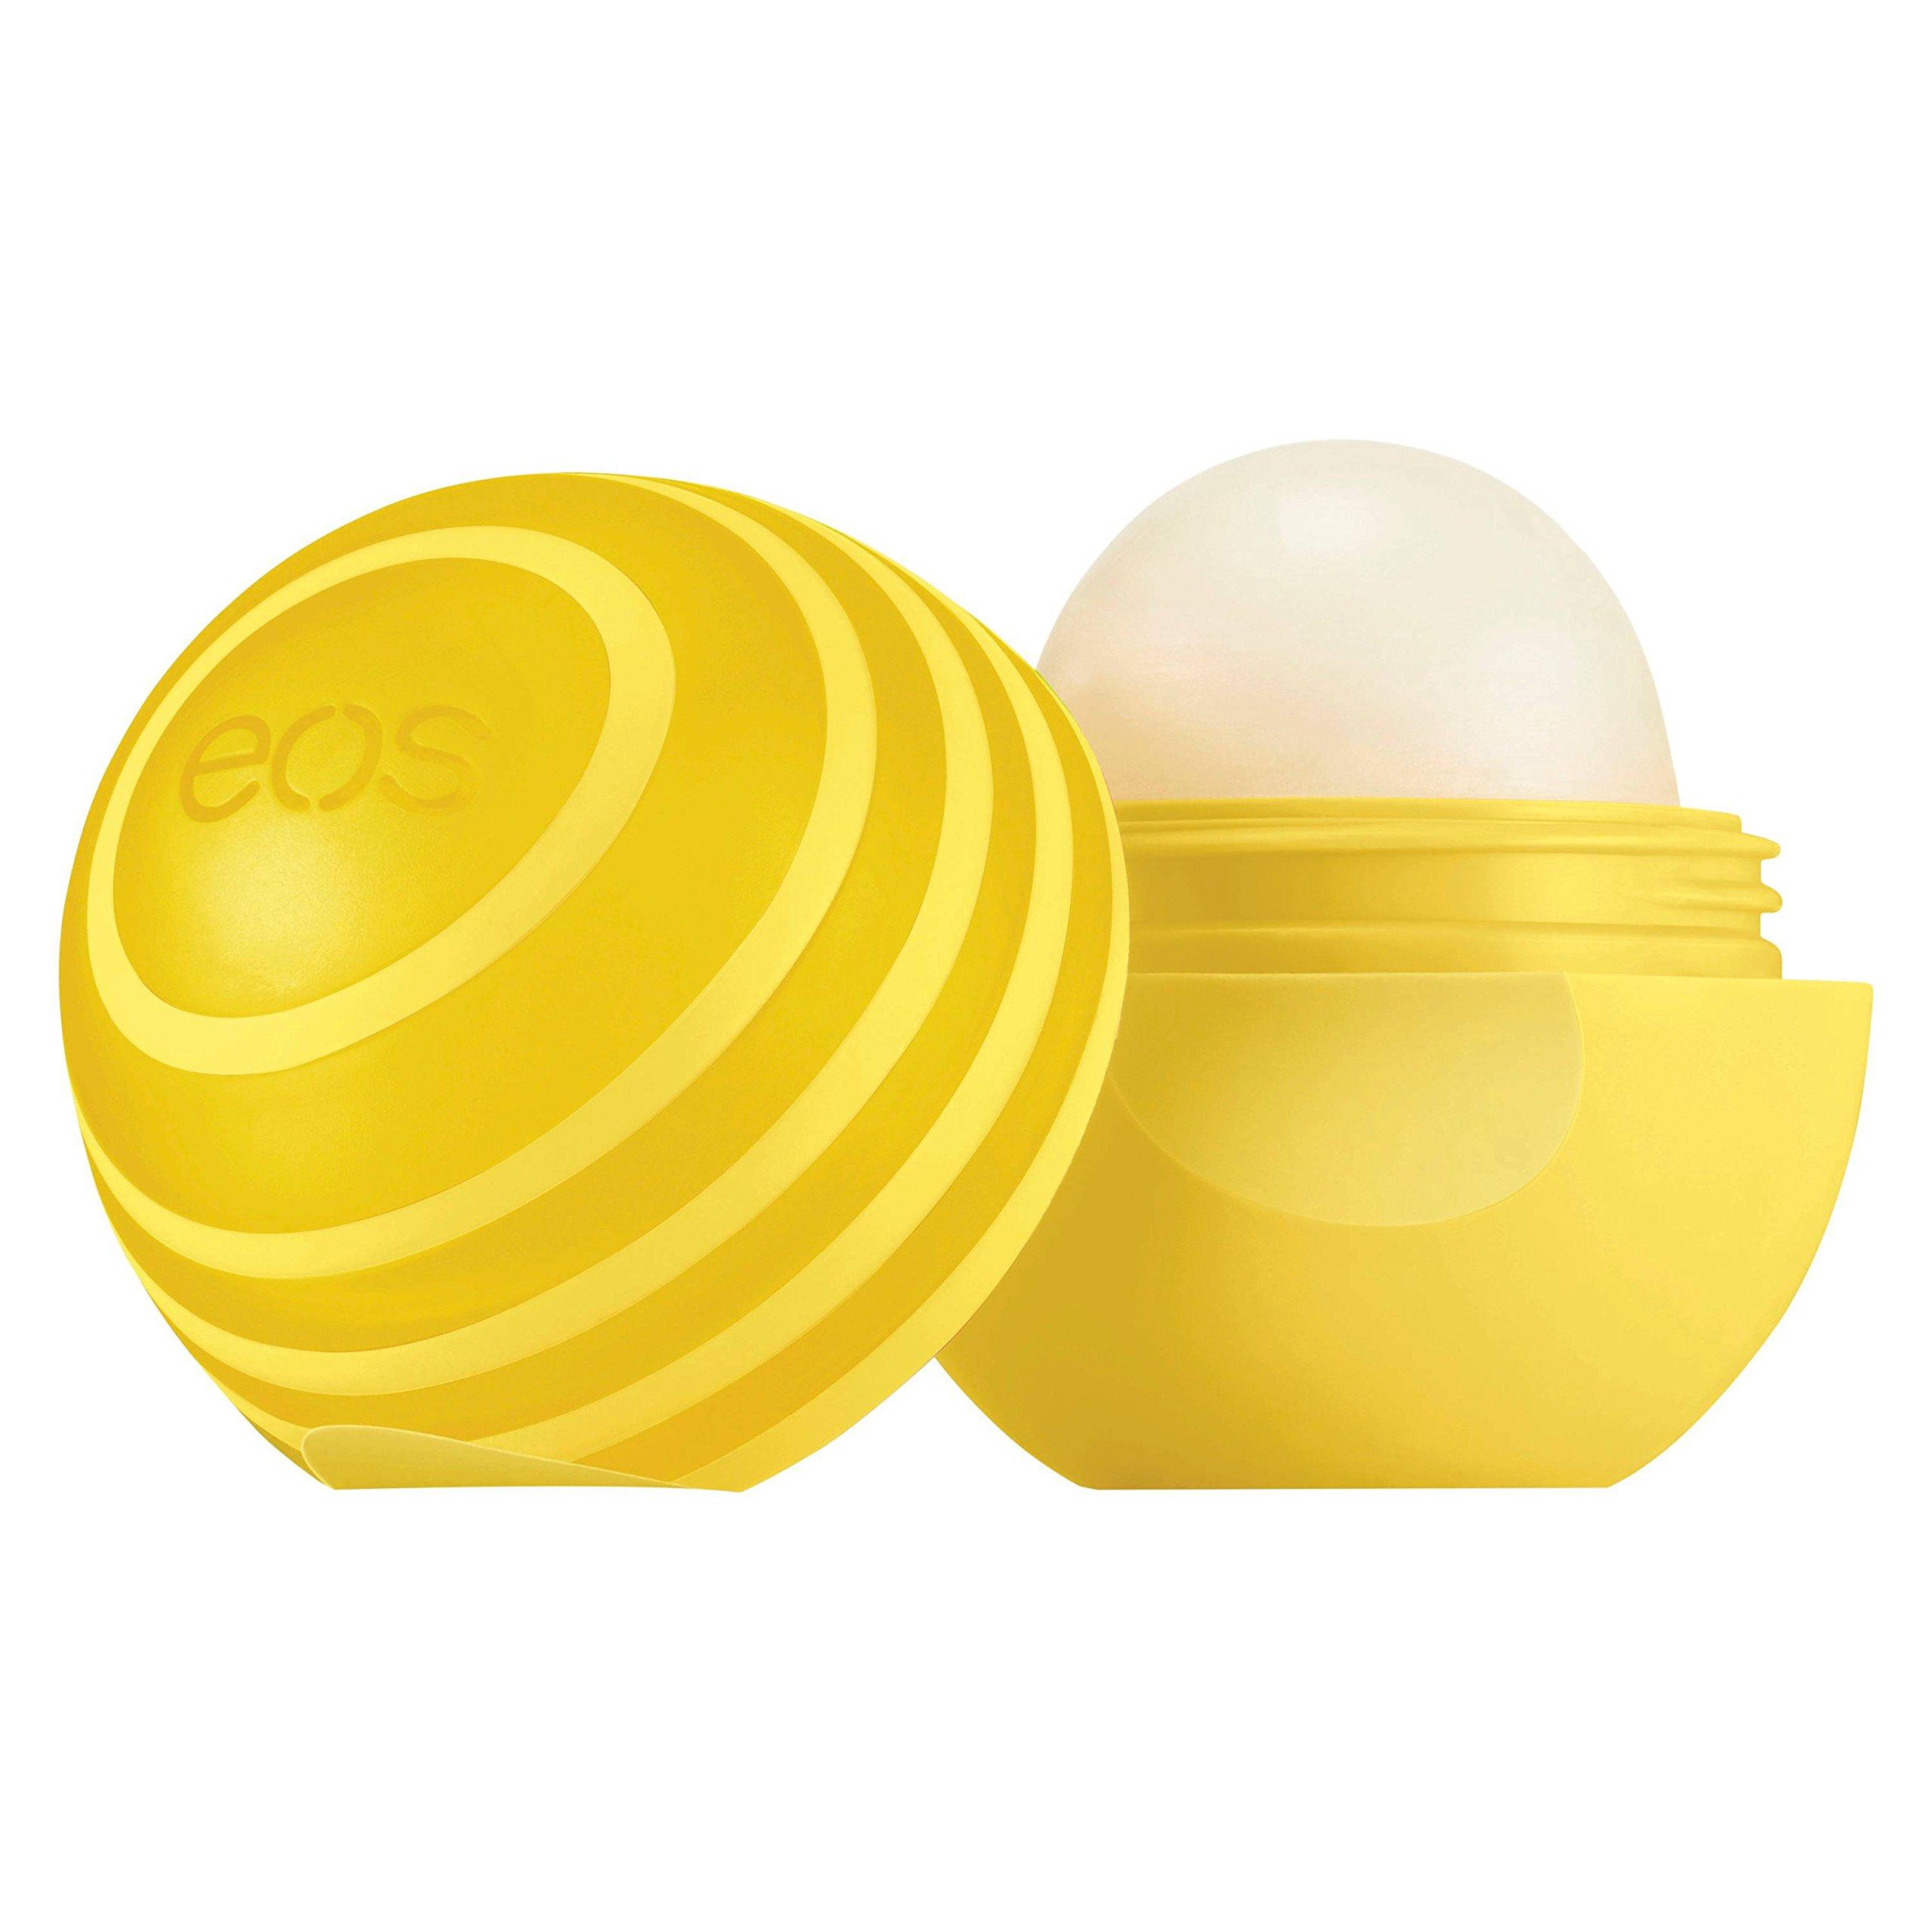 EOS Active Protection Lip Balm, Lemon Twist 0.25 oz